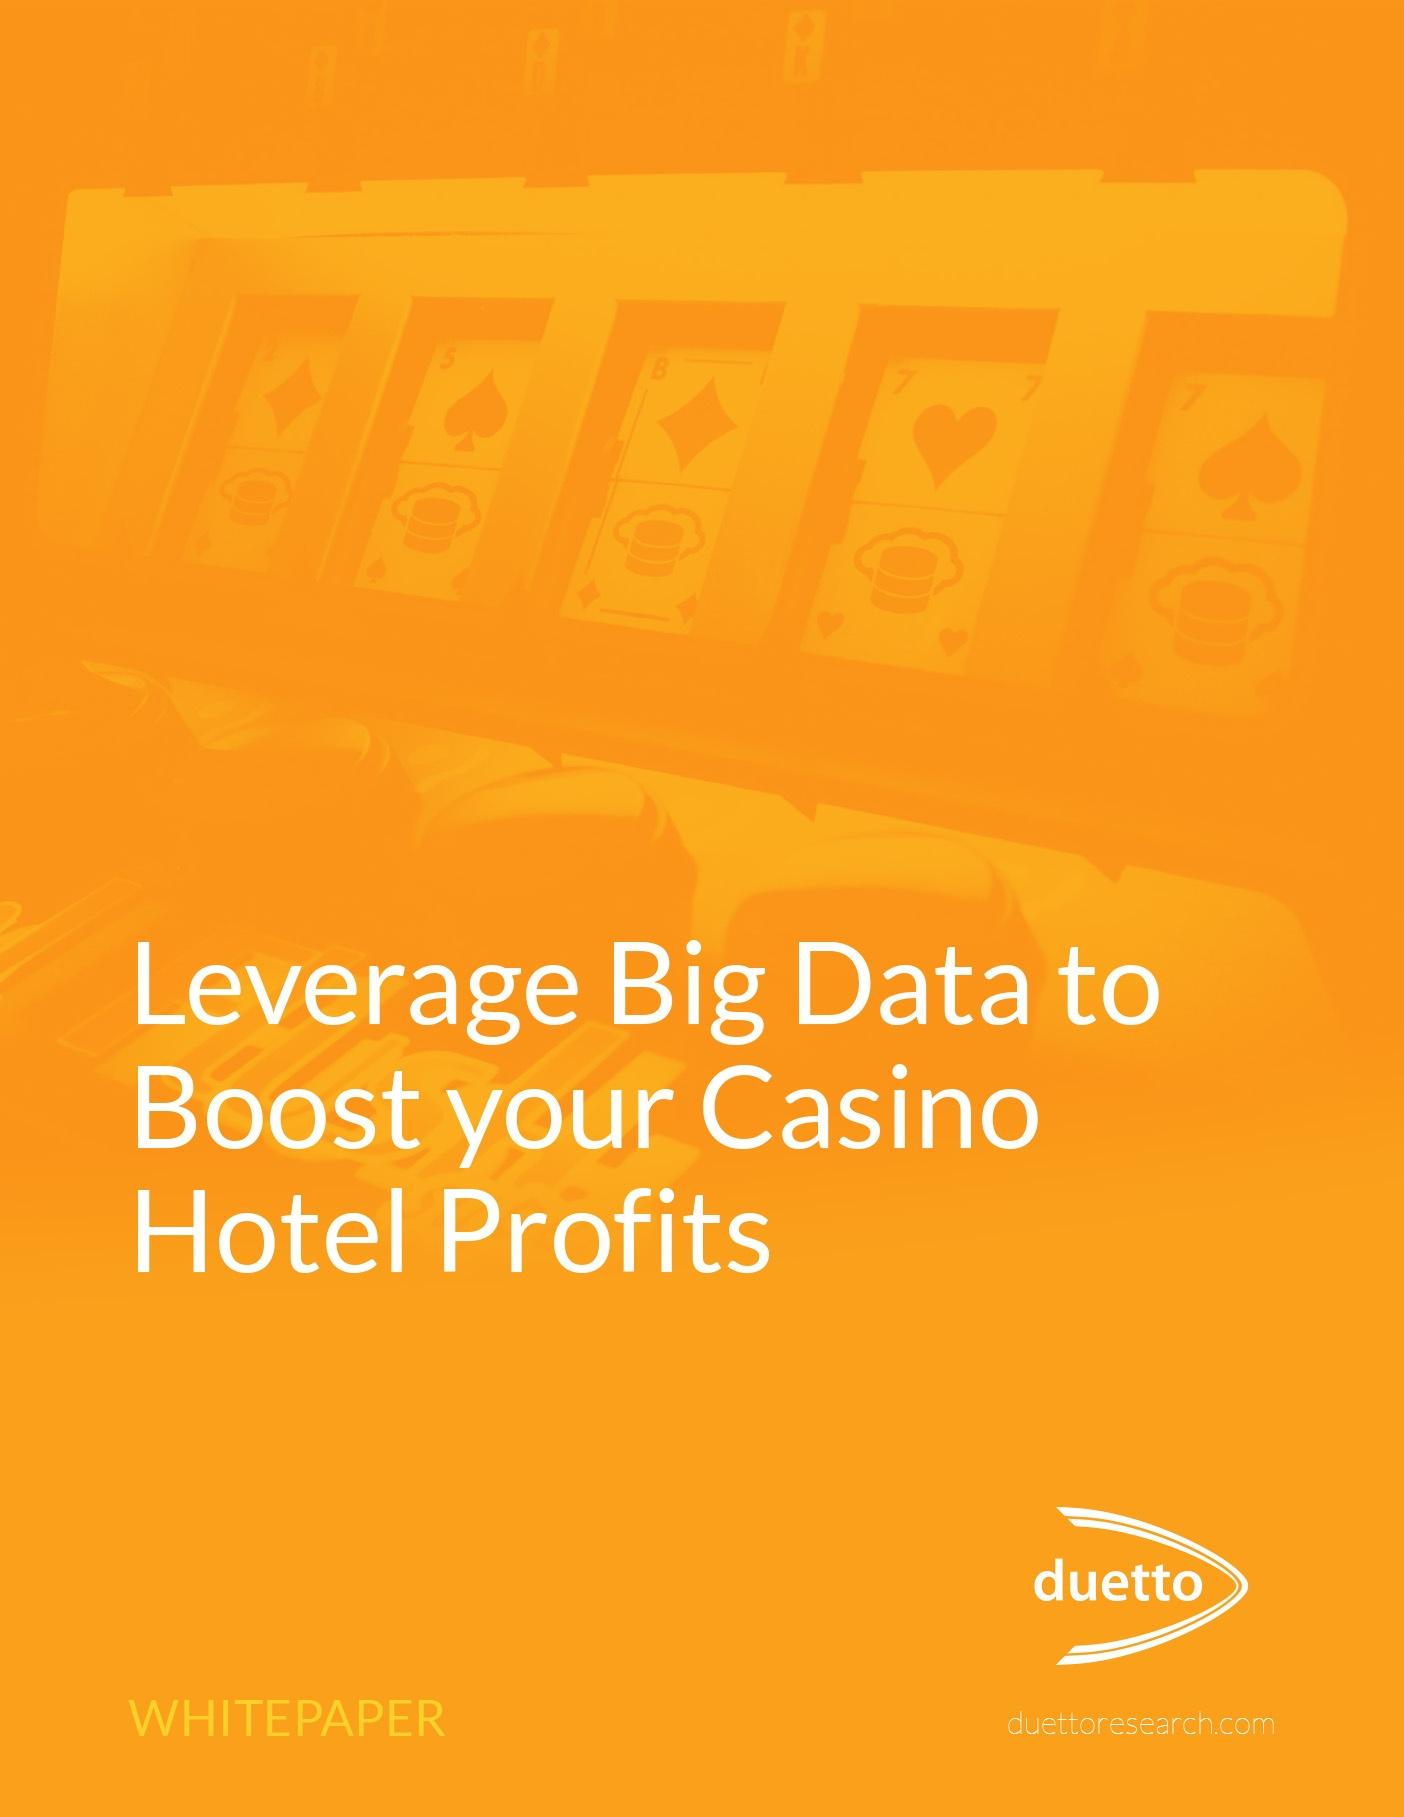 1Leverage-Big-Data-to-Boost-your-Hotel-Casino-Profits-1.jpg